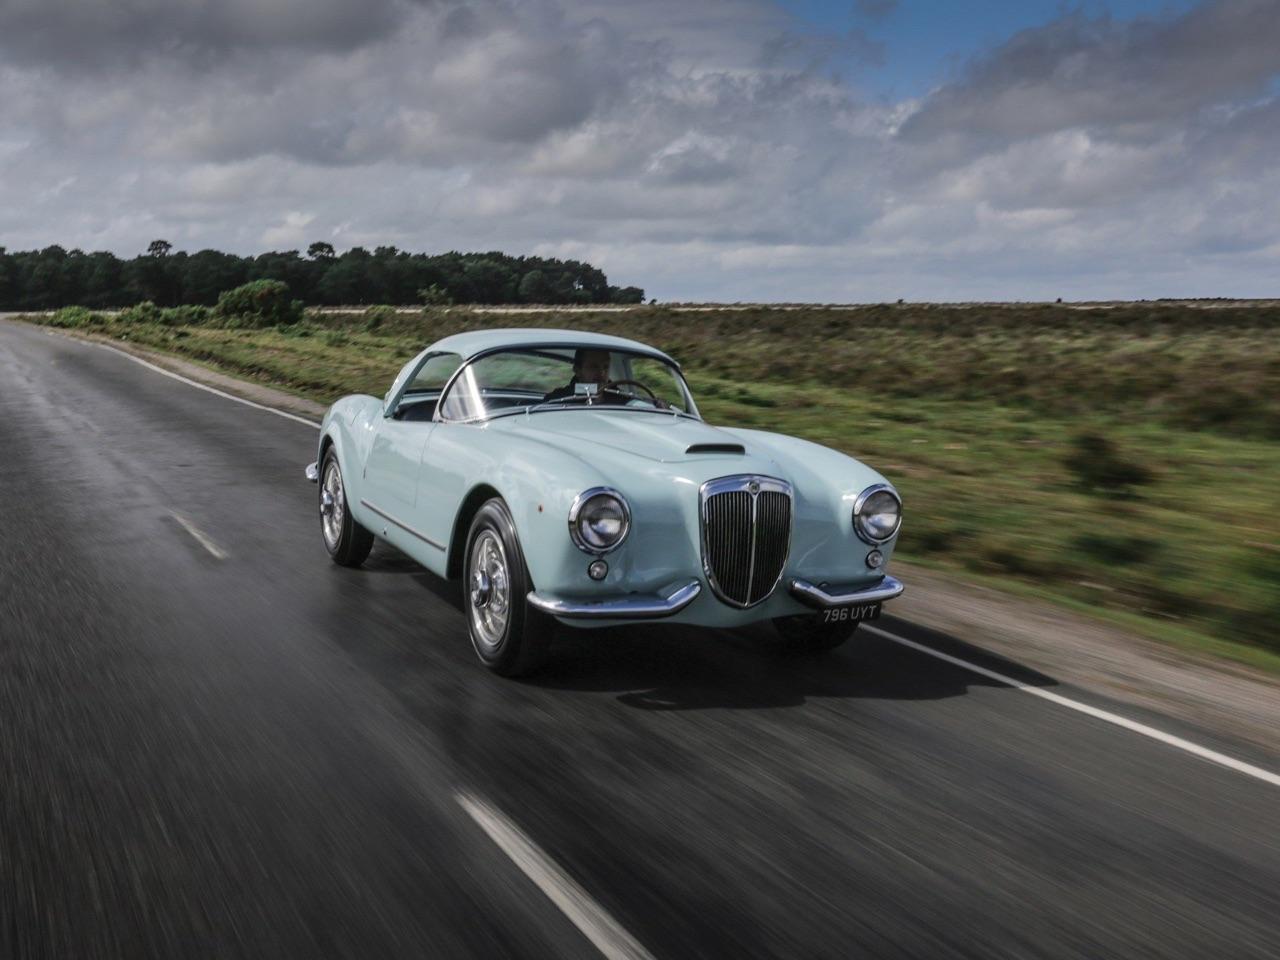 '55 Lancia Aurelia Spider B24... Perfetto ! 1